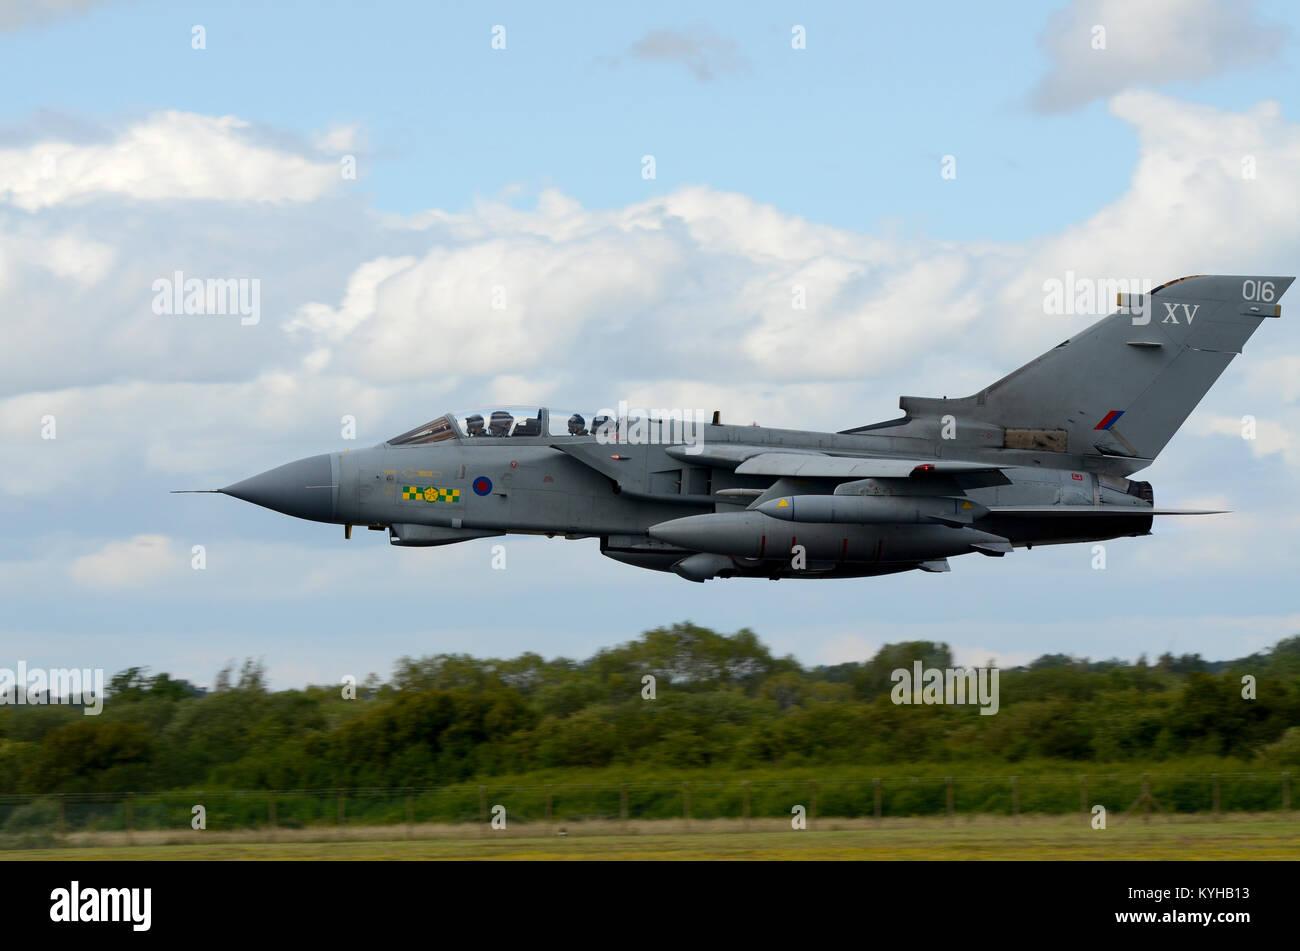 Royal Air Force RAF Tornado GR4 jet plane of 15 Squadron XV